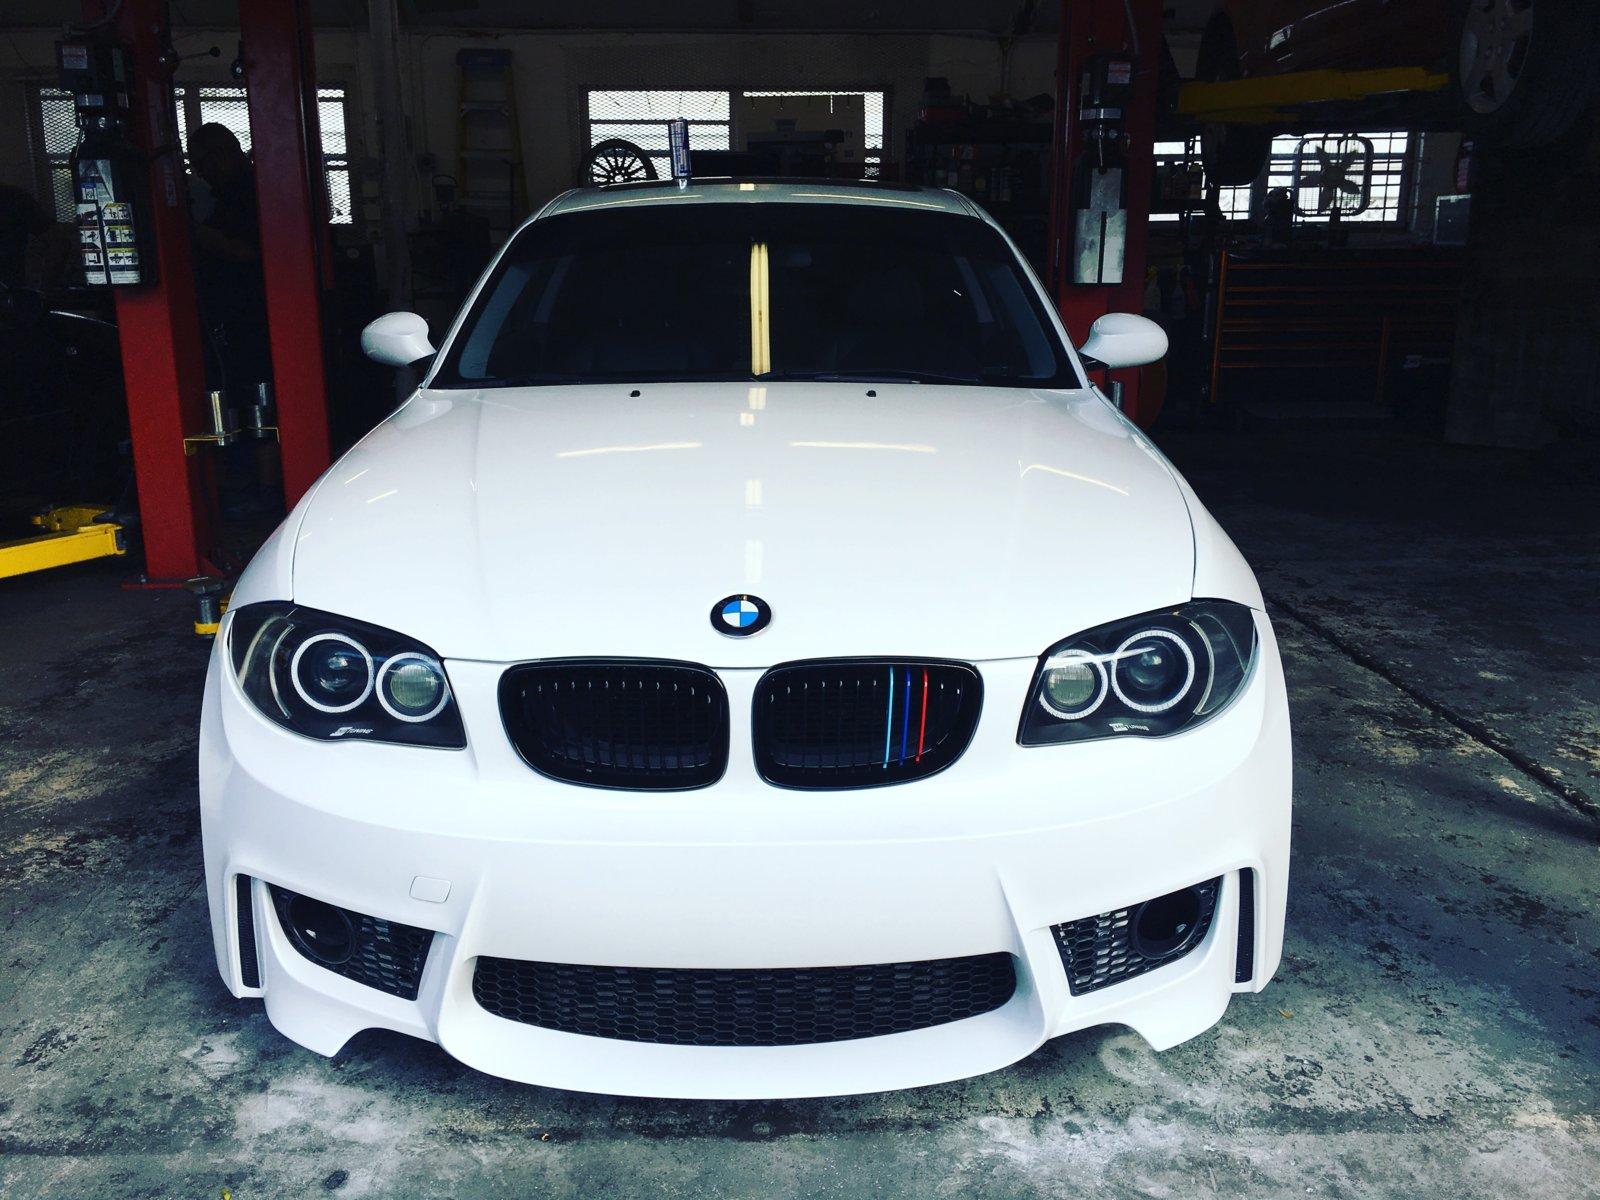 135i Low Pressue Issue | BMW Forums - SpoolStreet